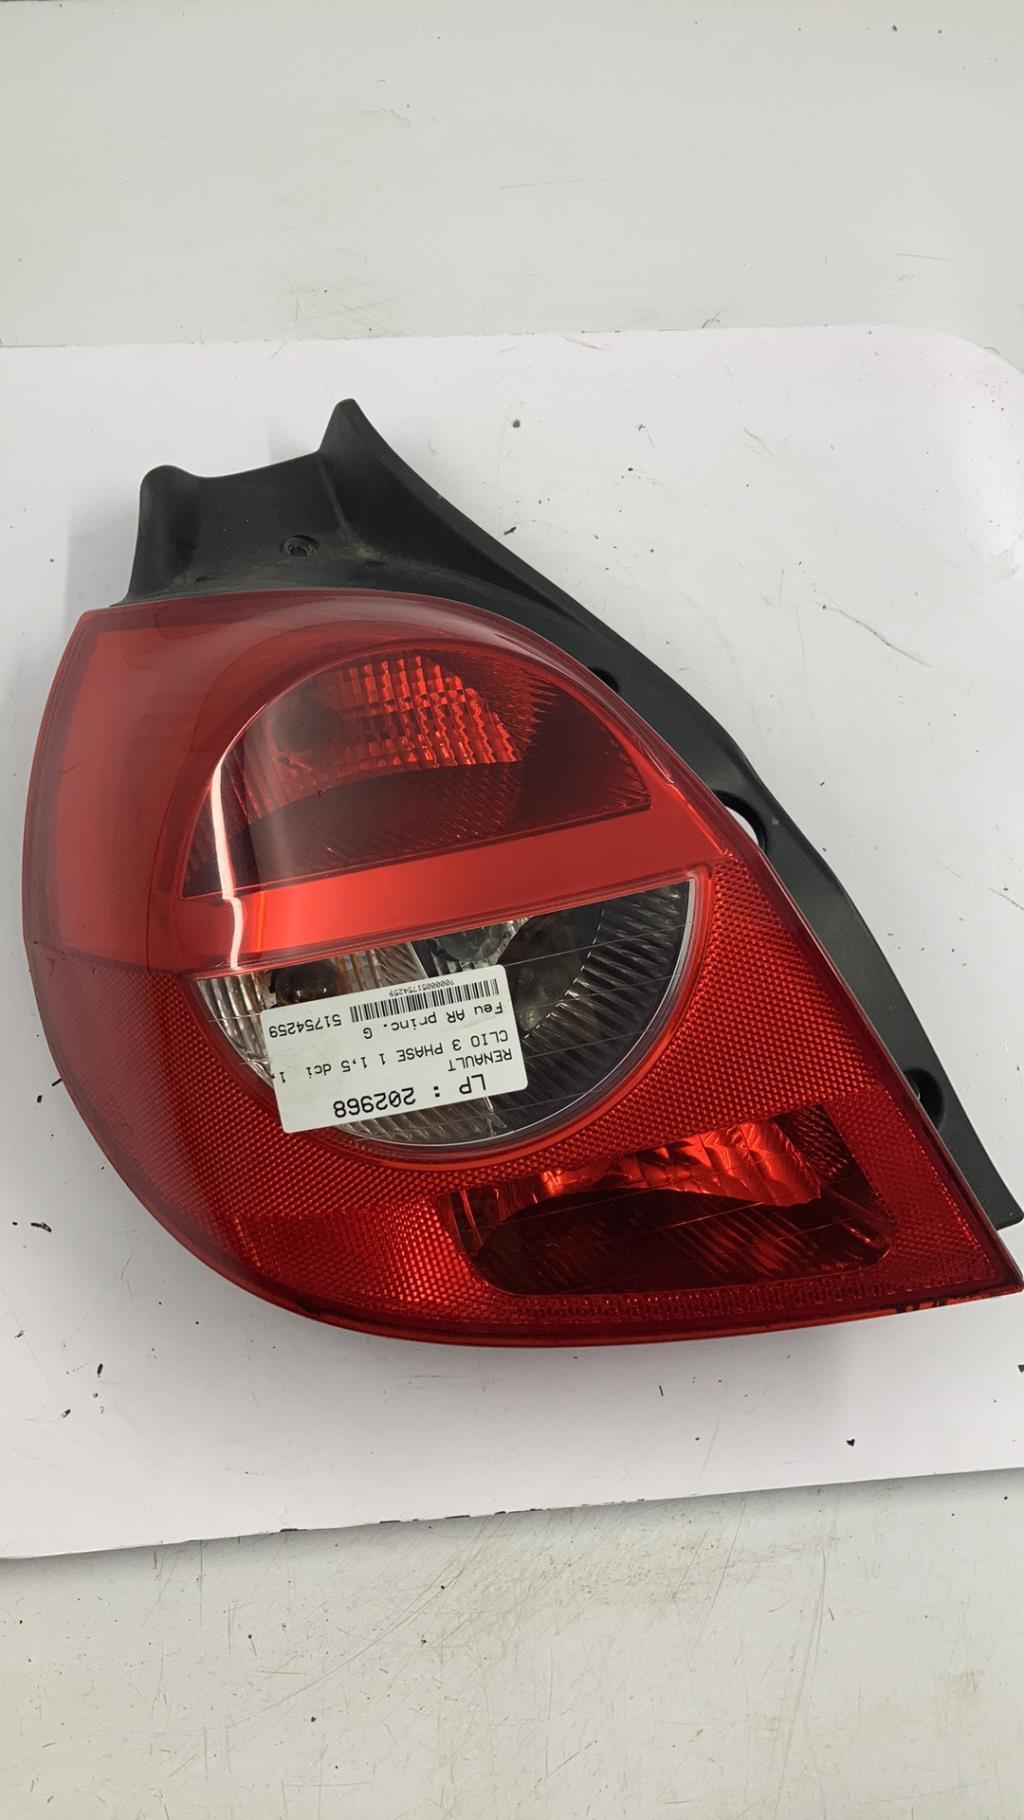 Feu arriere principal gauche (feux) RENAULT CLIO 3 PHASE 1 Diesel